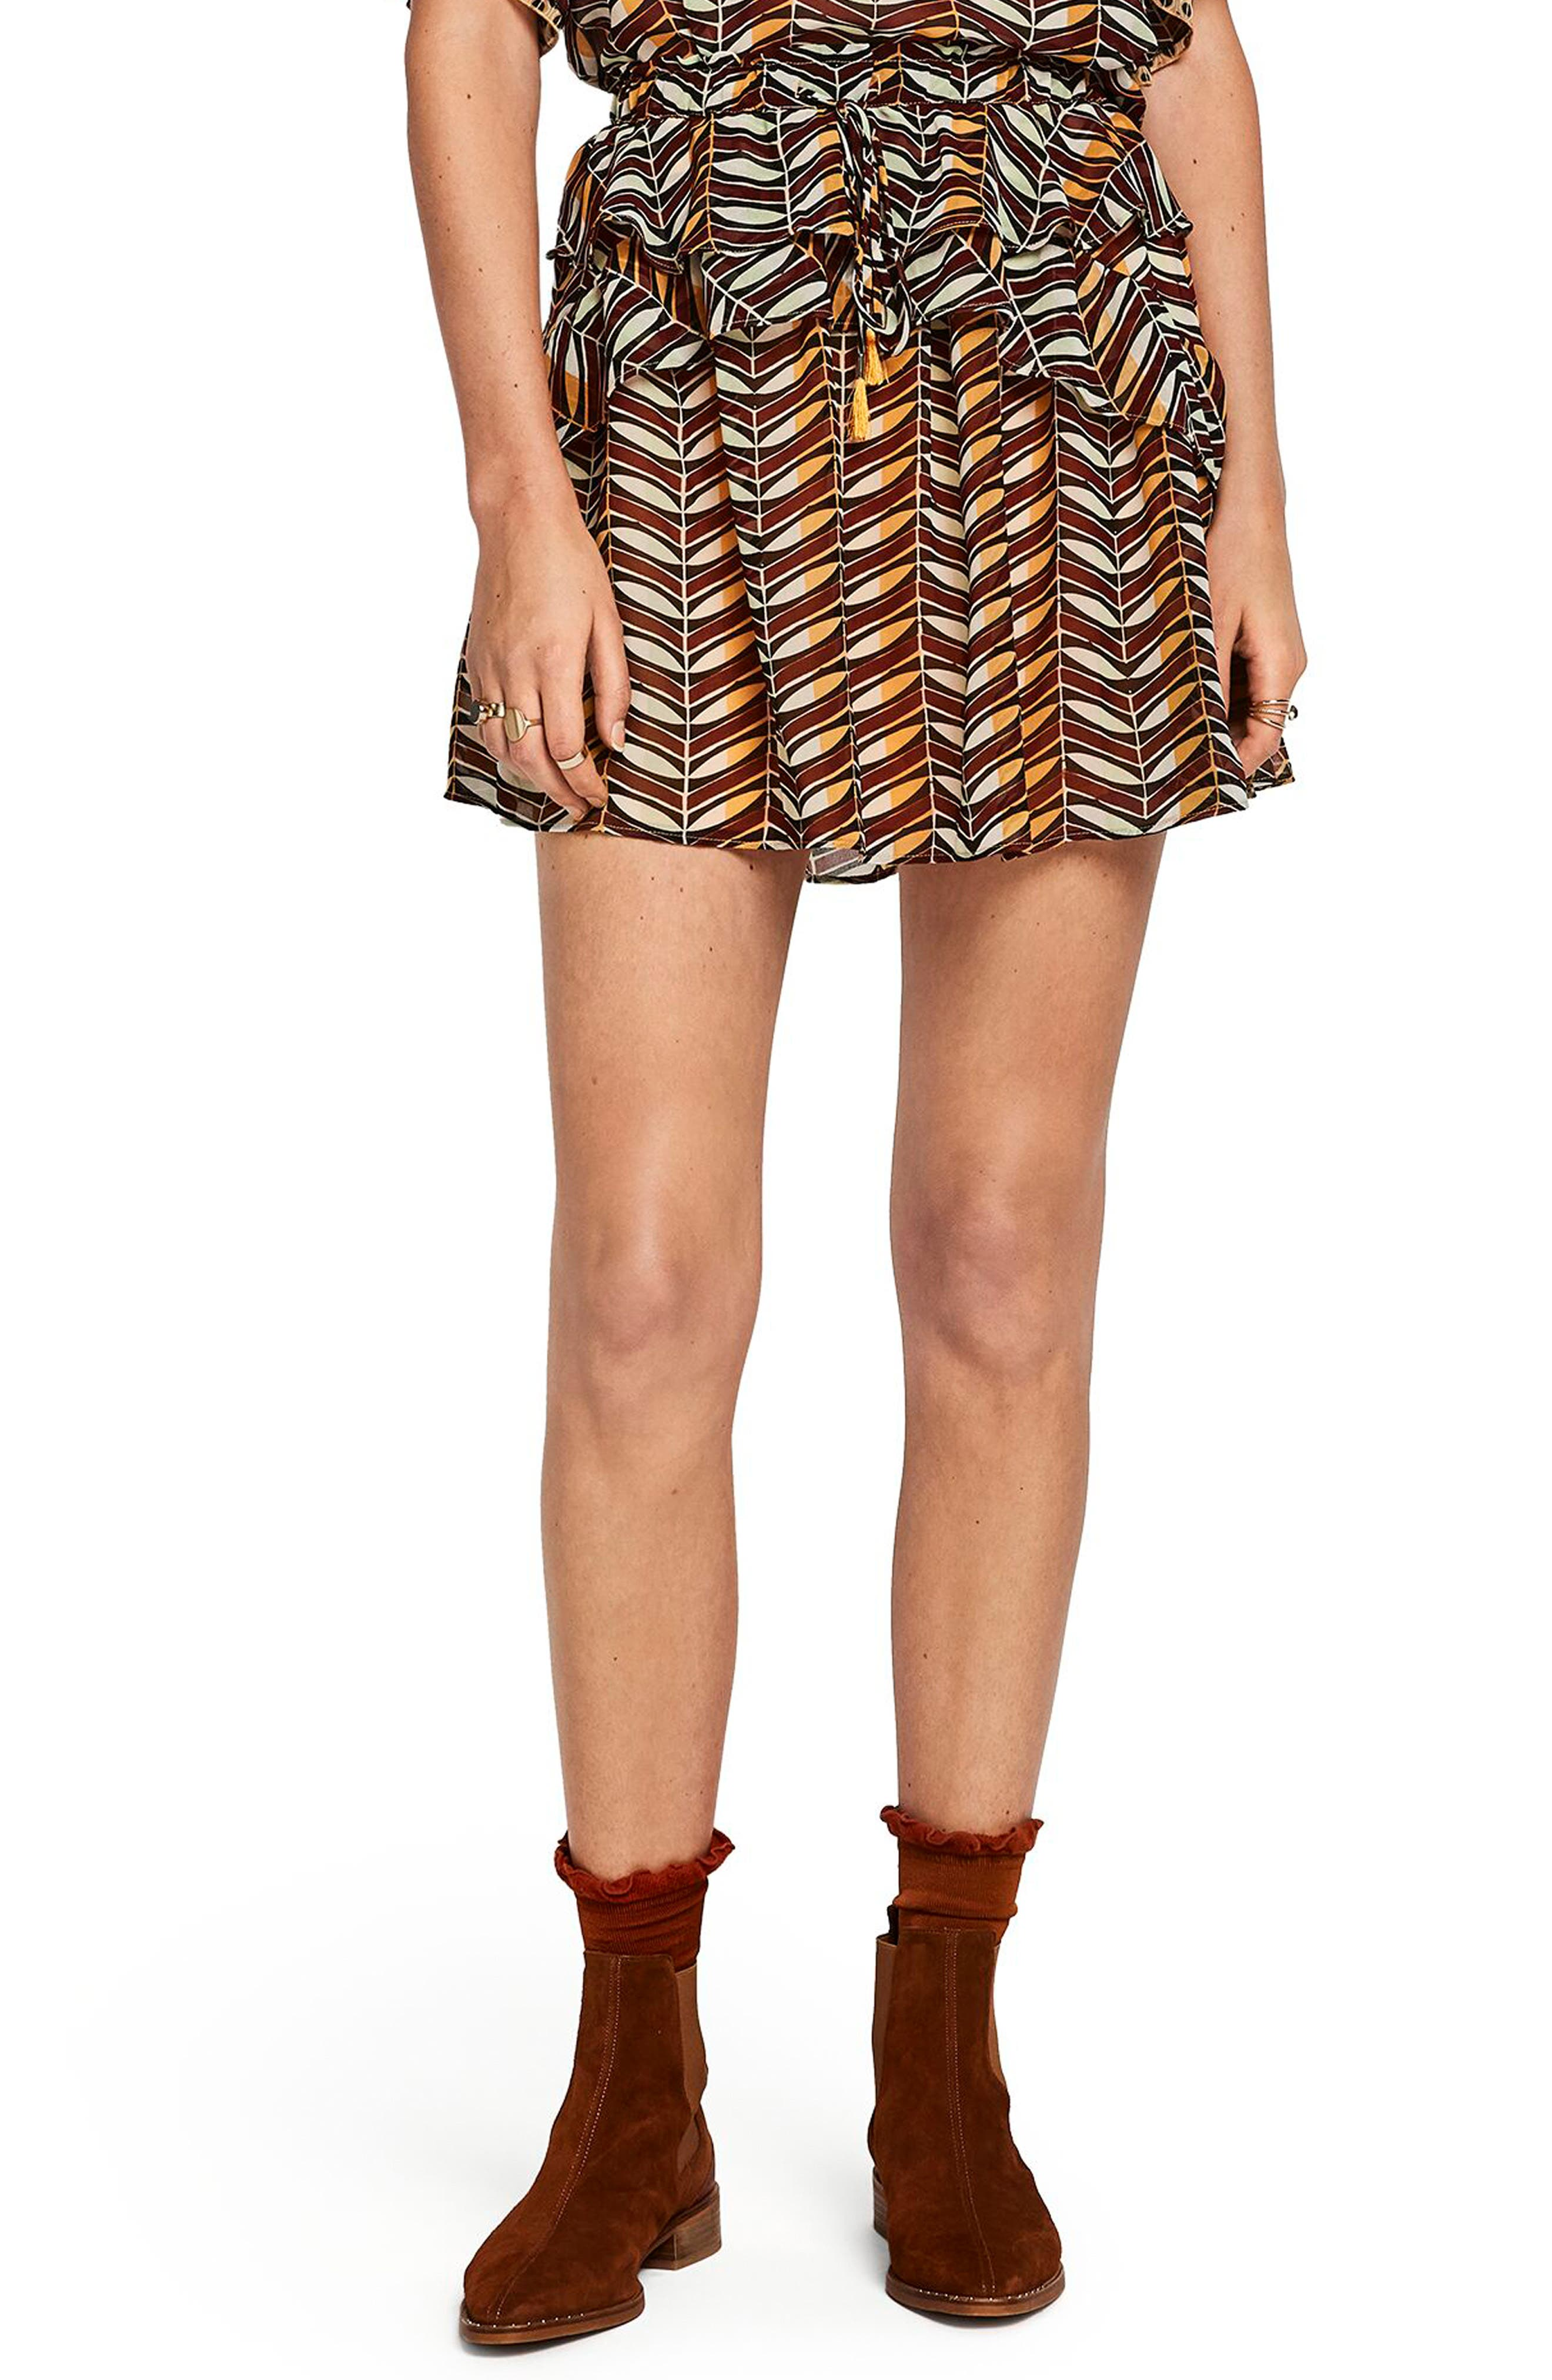 Scotch & Soda Print Ruffle Skirt, Black